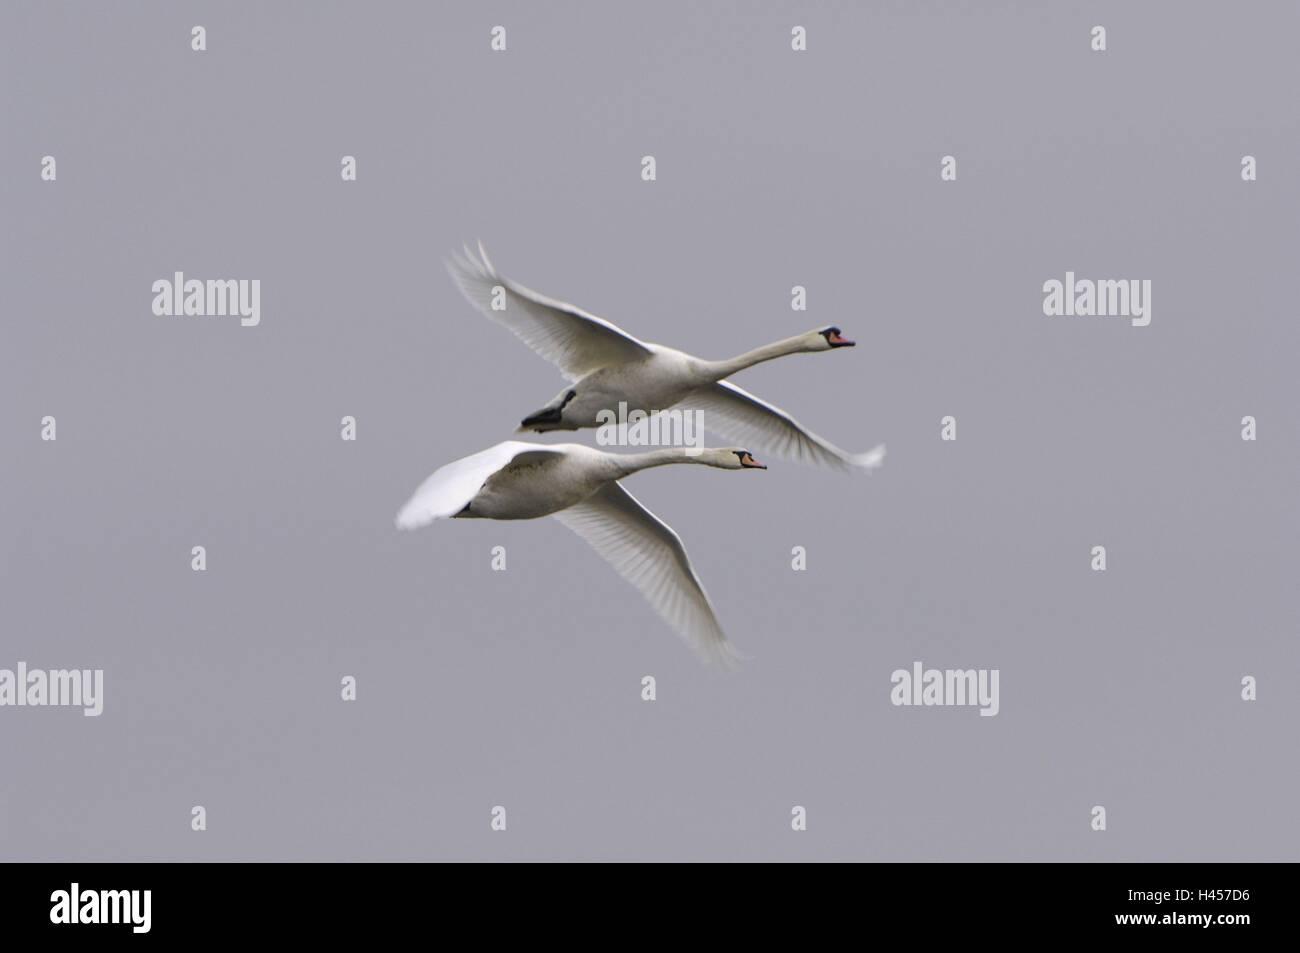 Hump swans, Cygnus olor, flight, - Stock Image